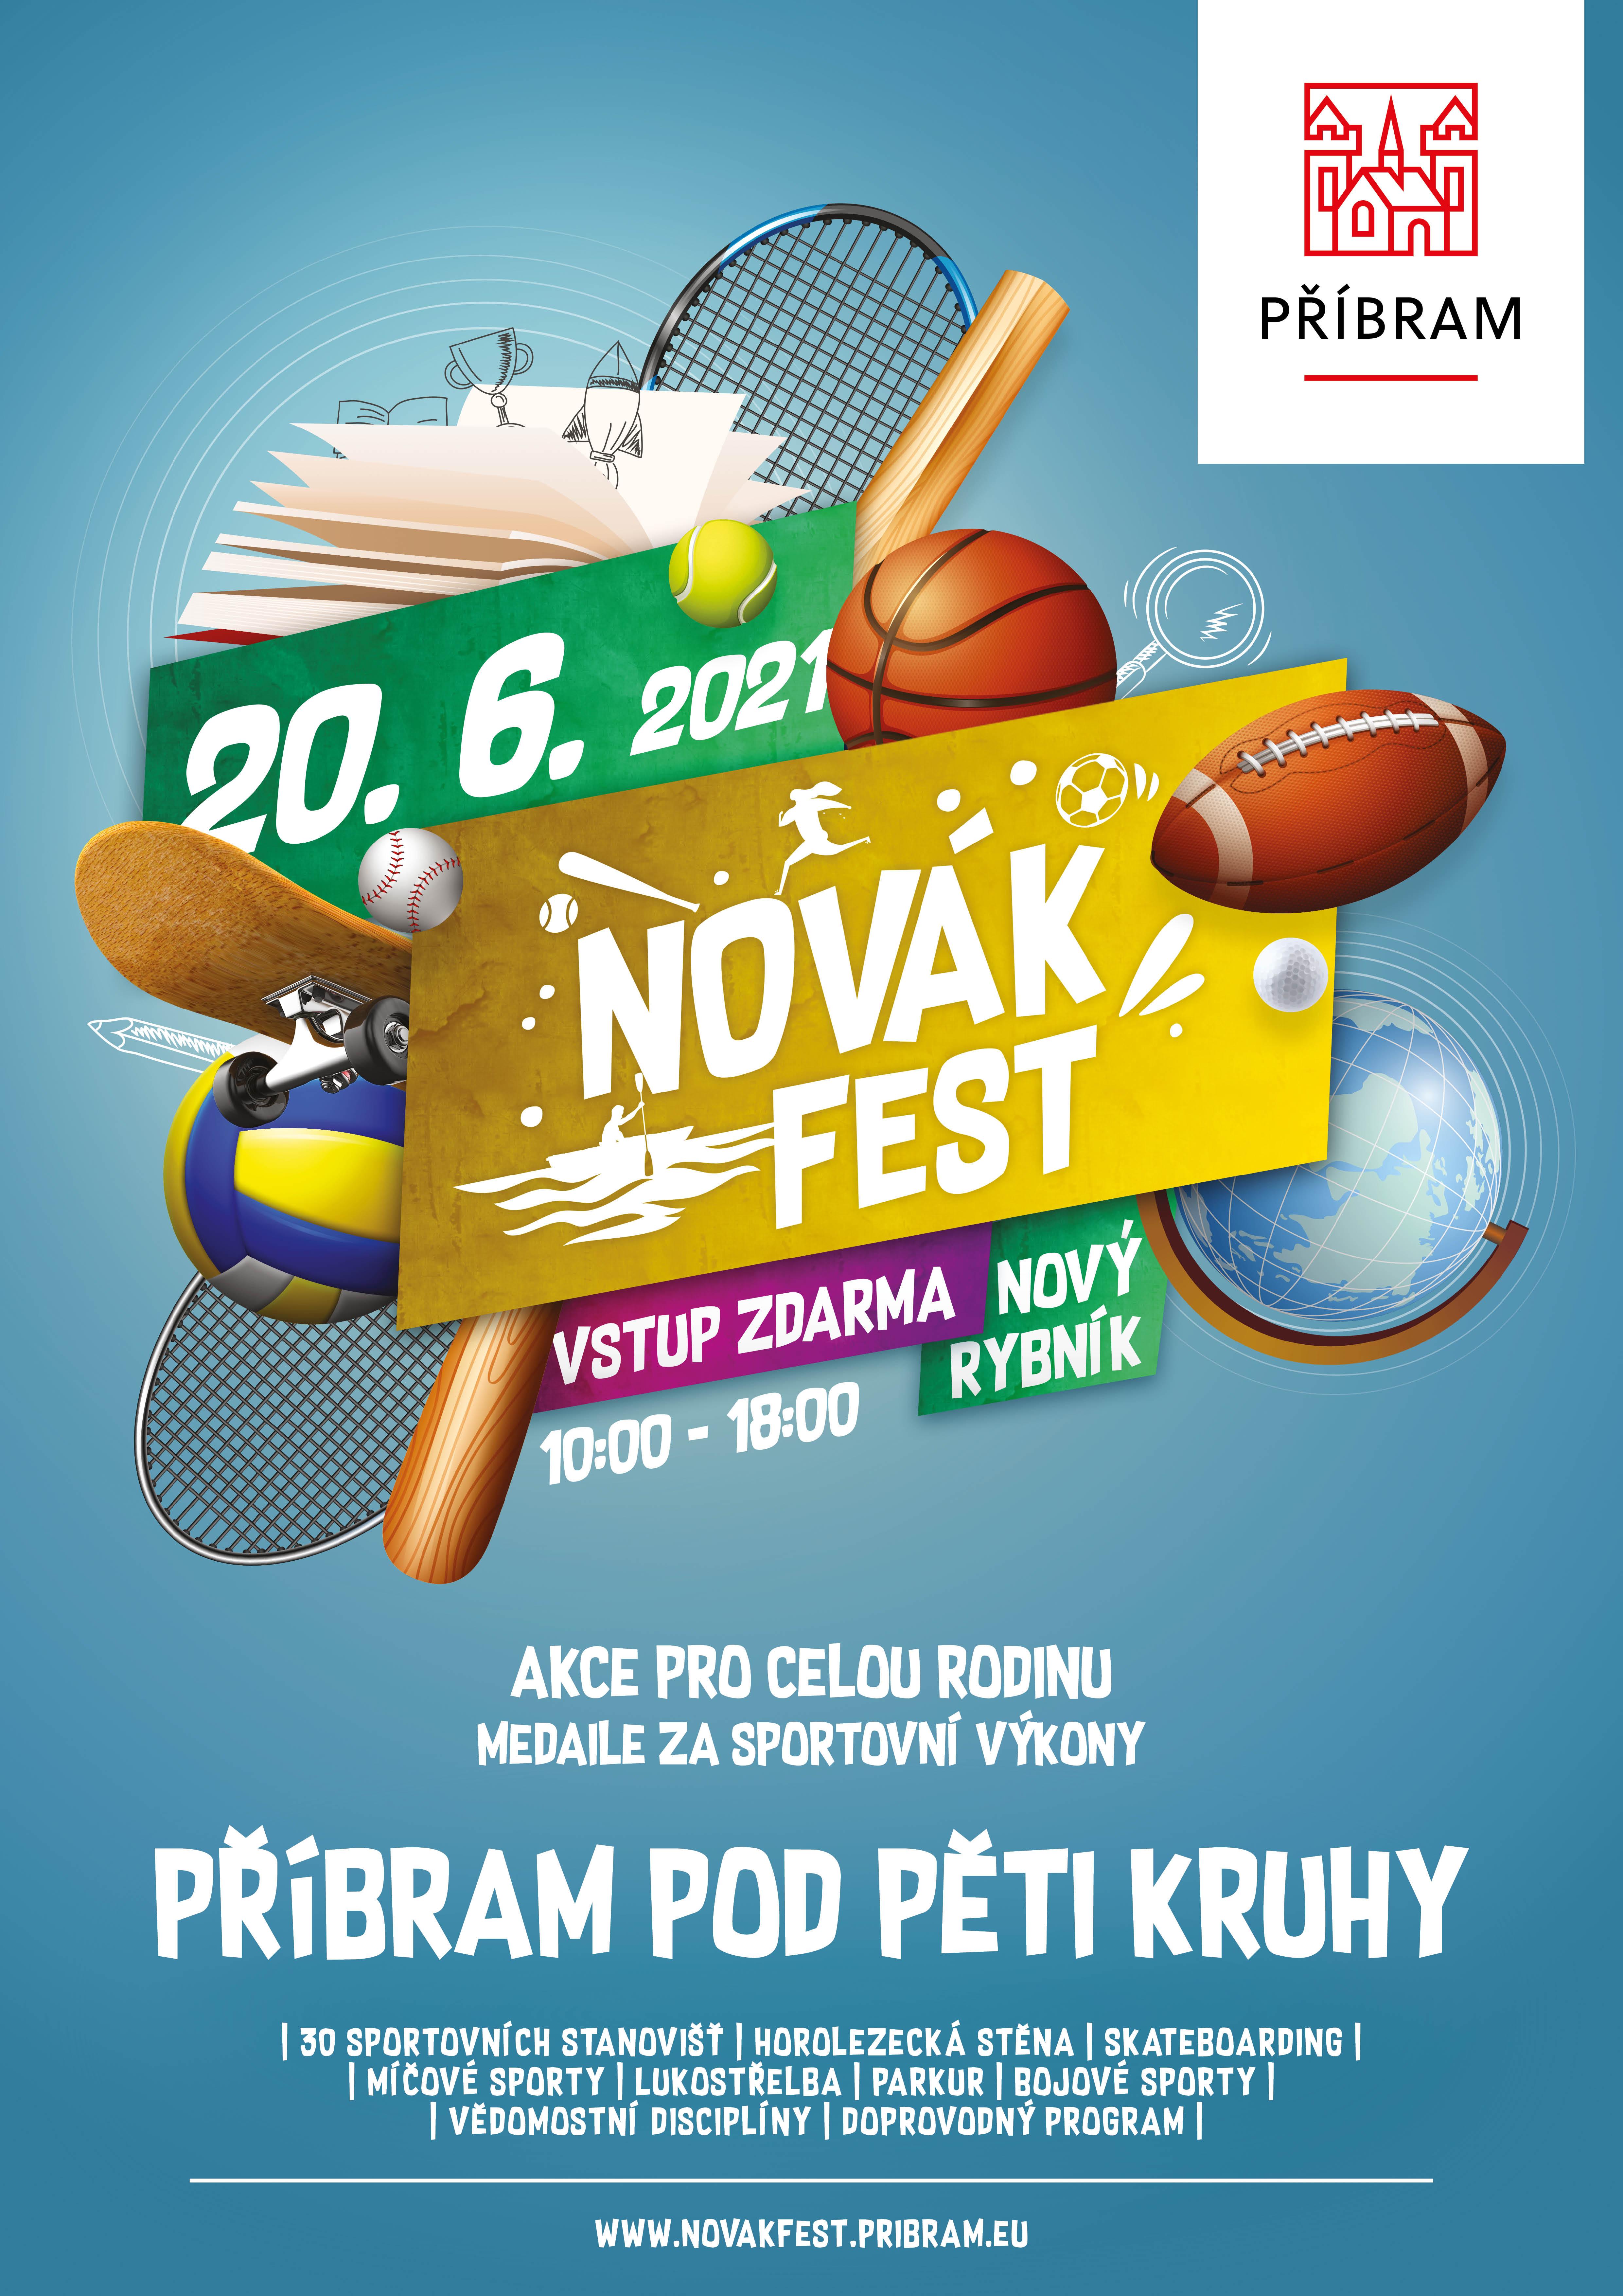 NovakFest